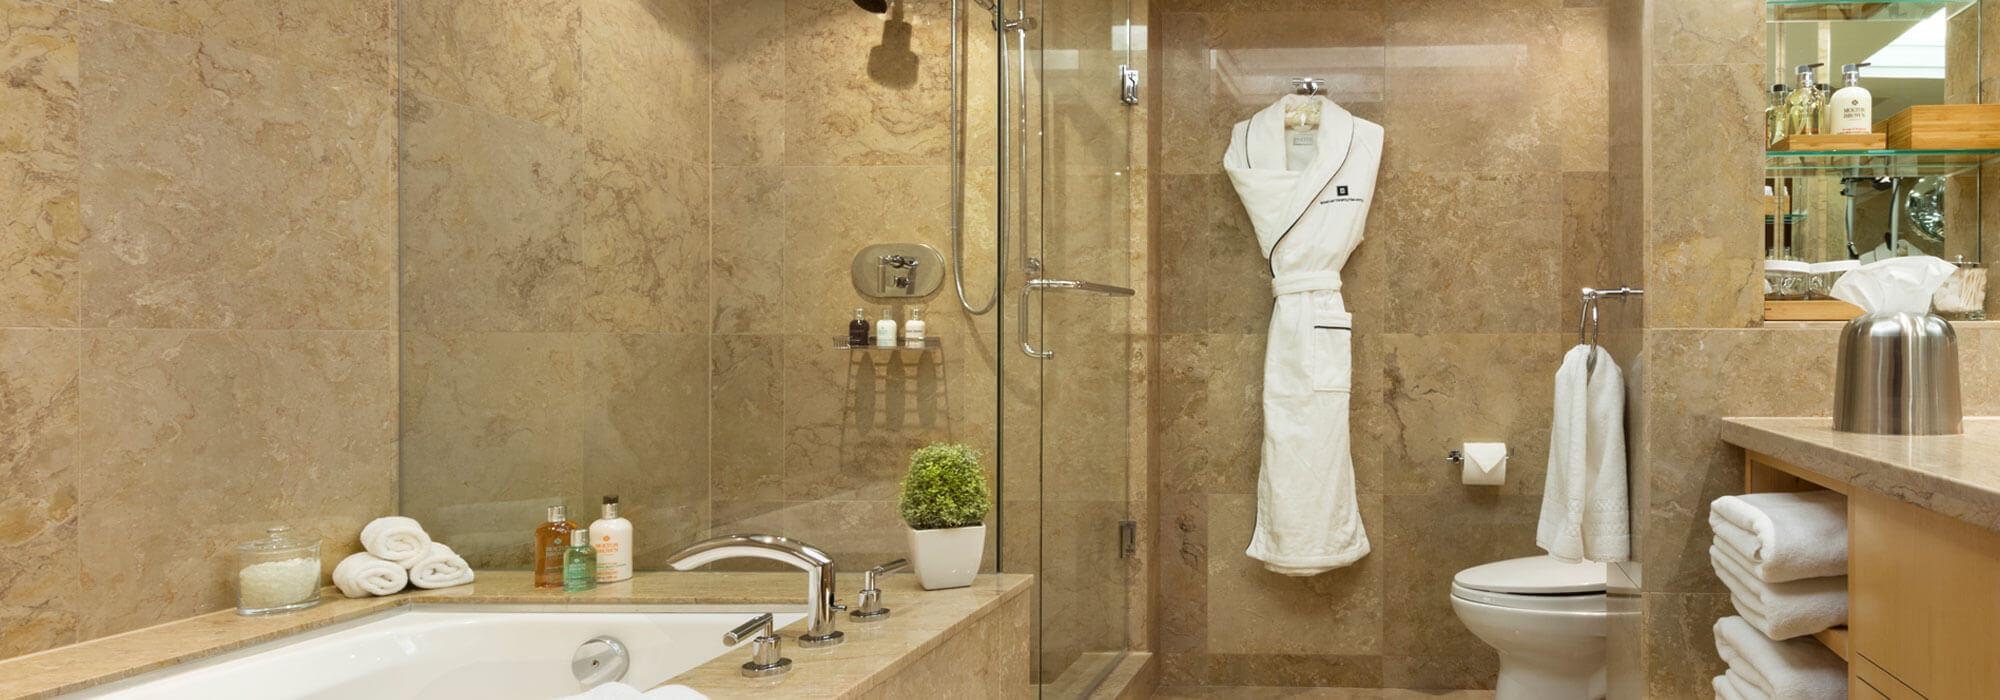 SoHo Hotel accommodations Sahara marble bathroom with heated flooring